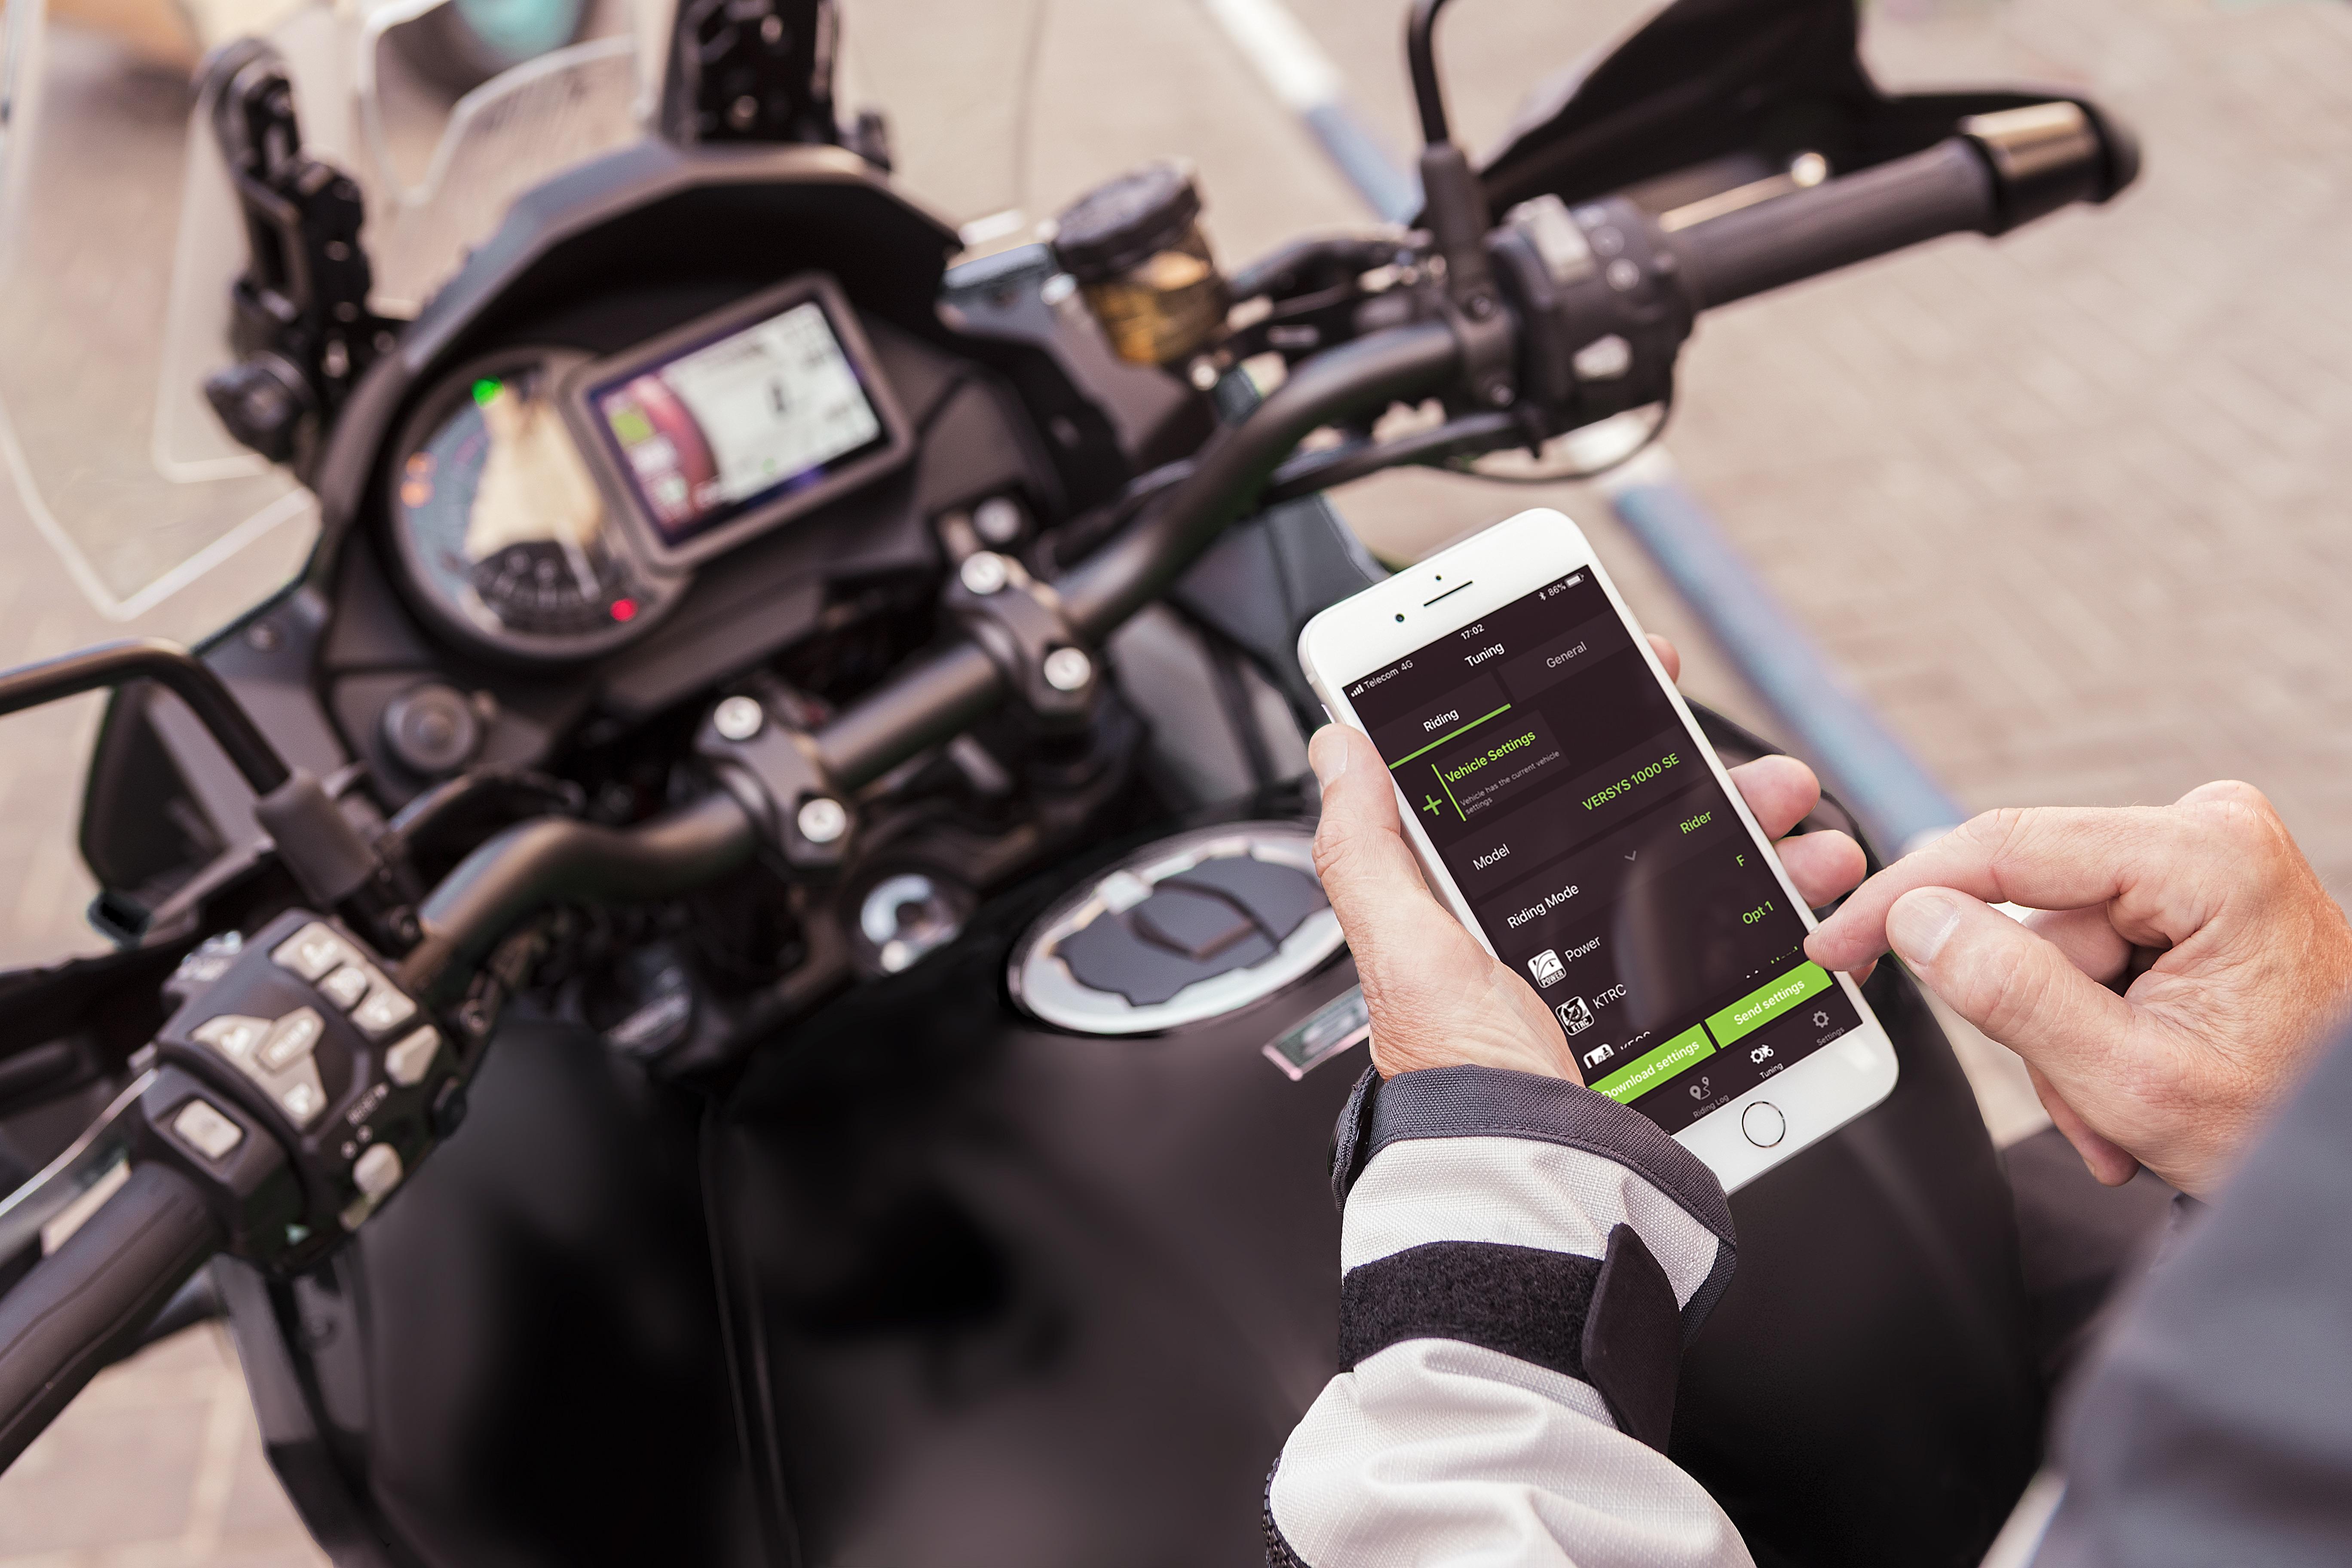 Rider using RIDEOLOGY THE APP on phone on their Kawasaki motorcycle